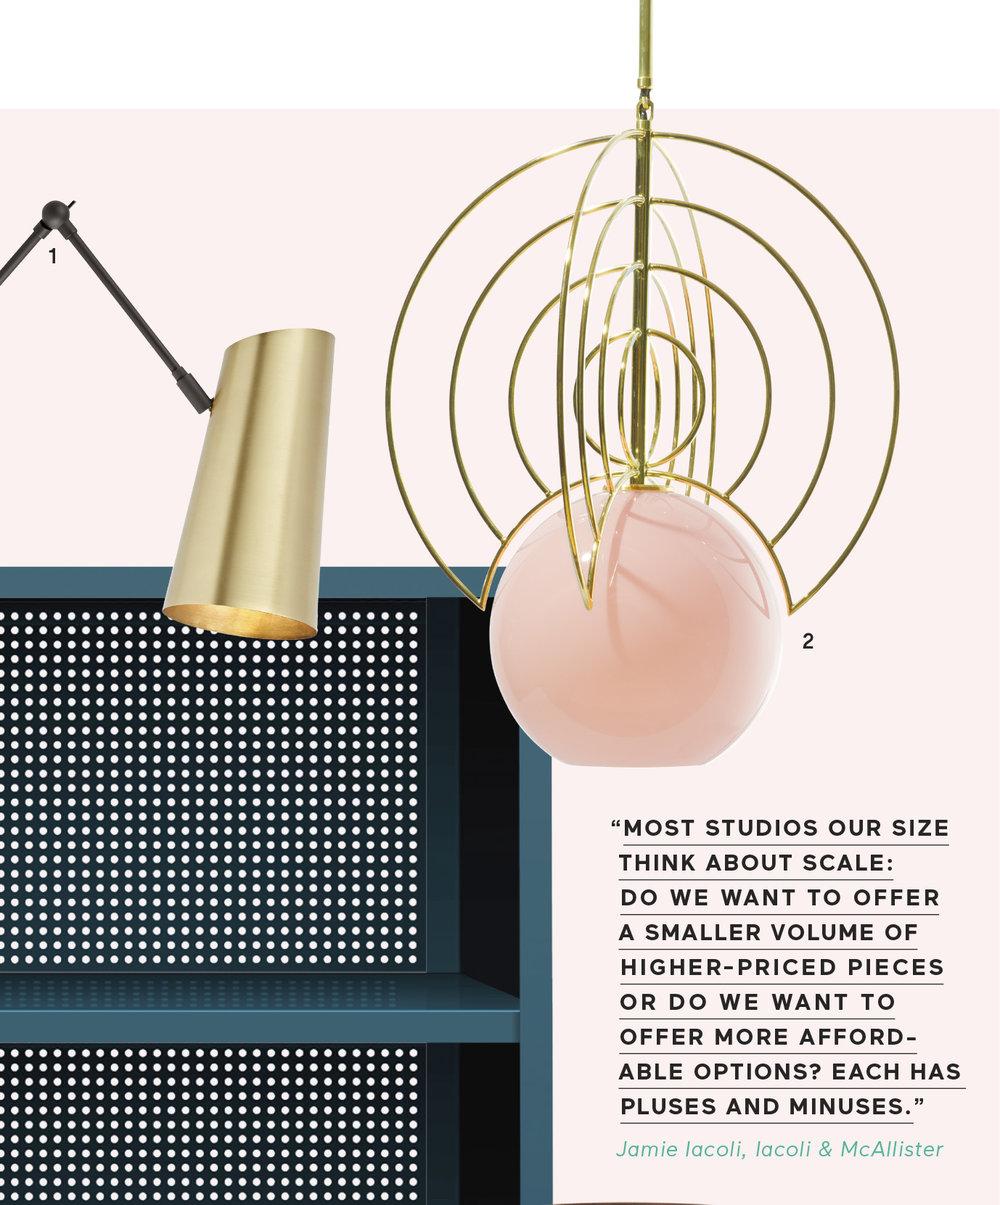 Dwell Magazine | Sept 2017